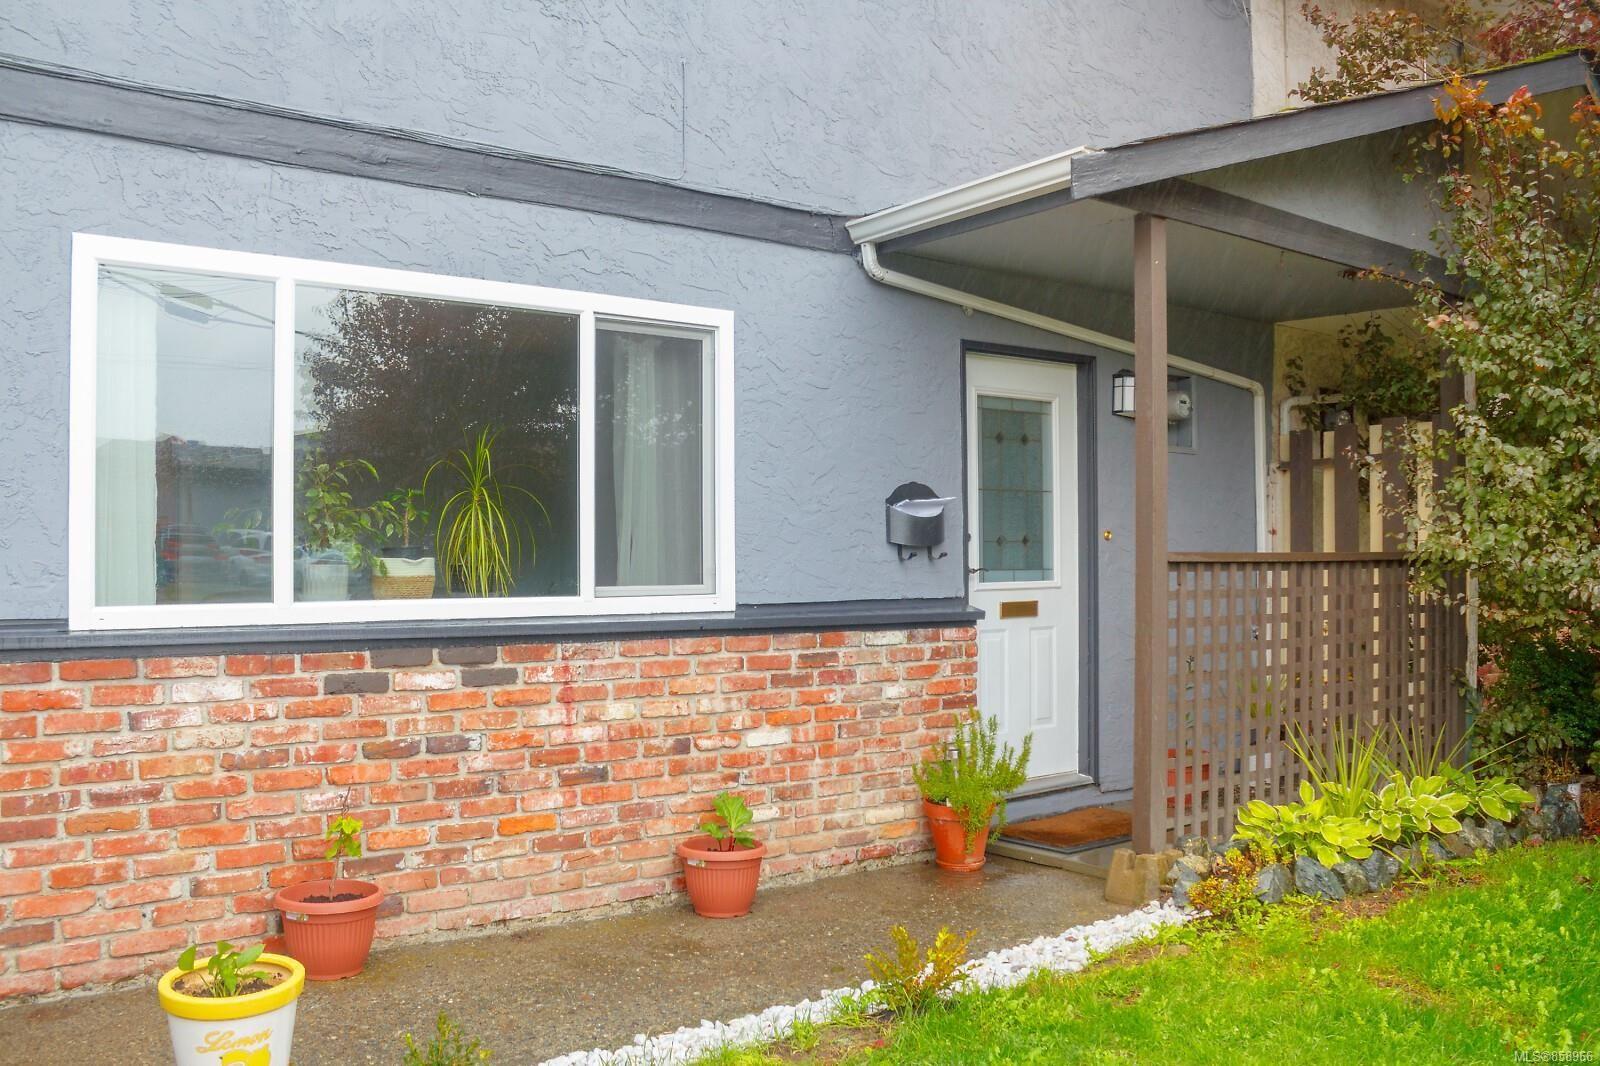 Main Photo: 728 Danbrook Ave in : La Langford Proper Half Duplex for sale (Langford)  : MLS®# 858966